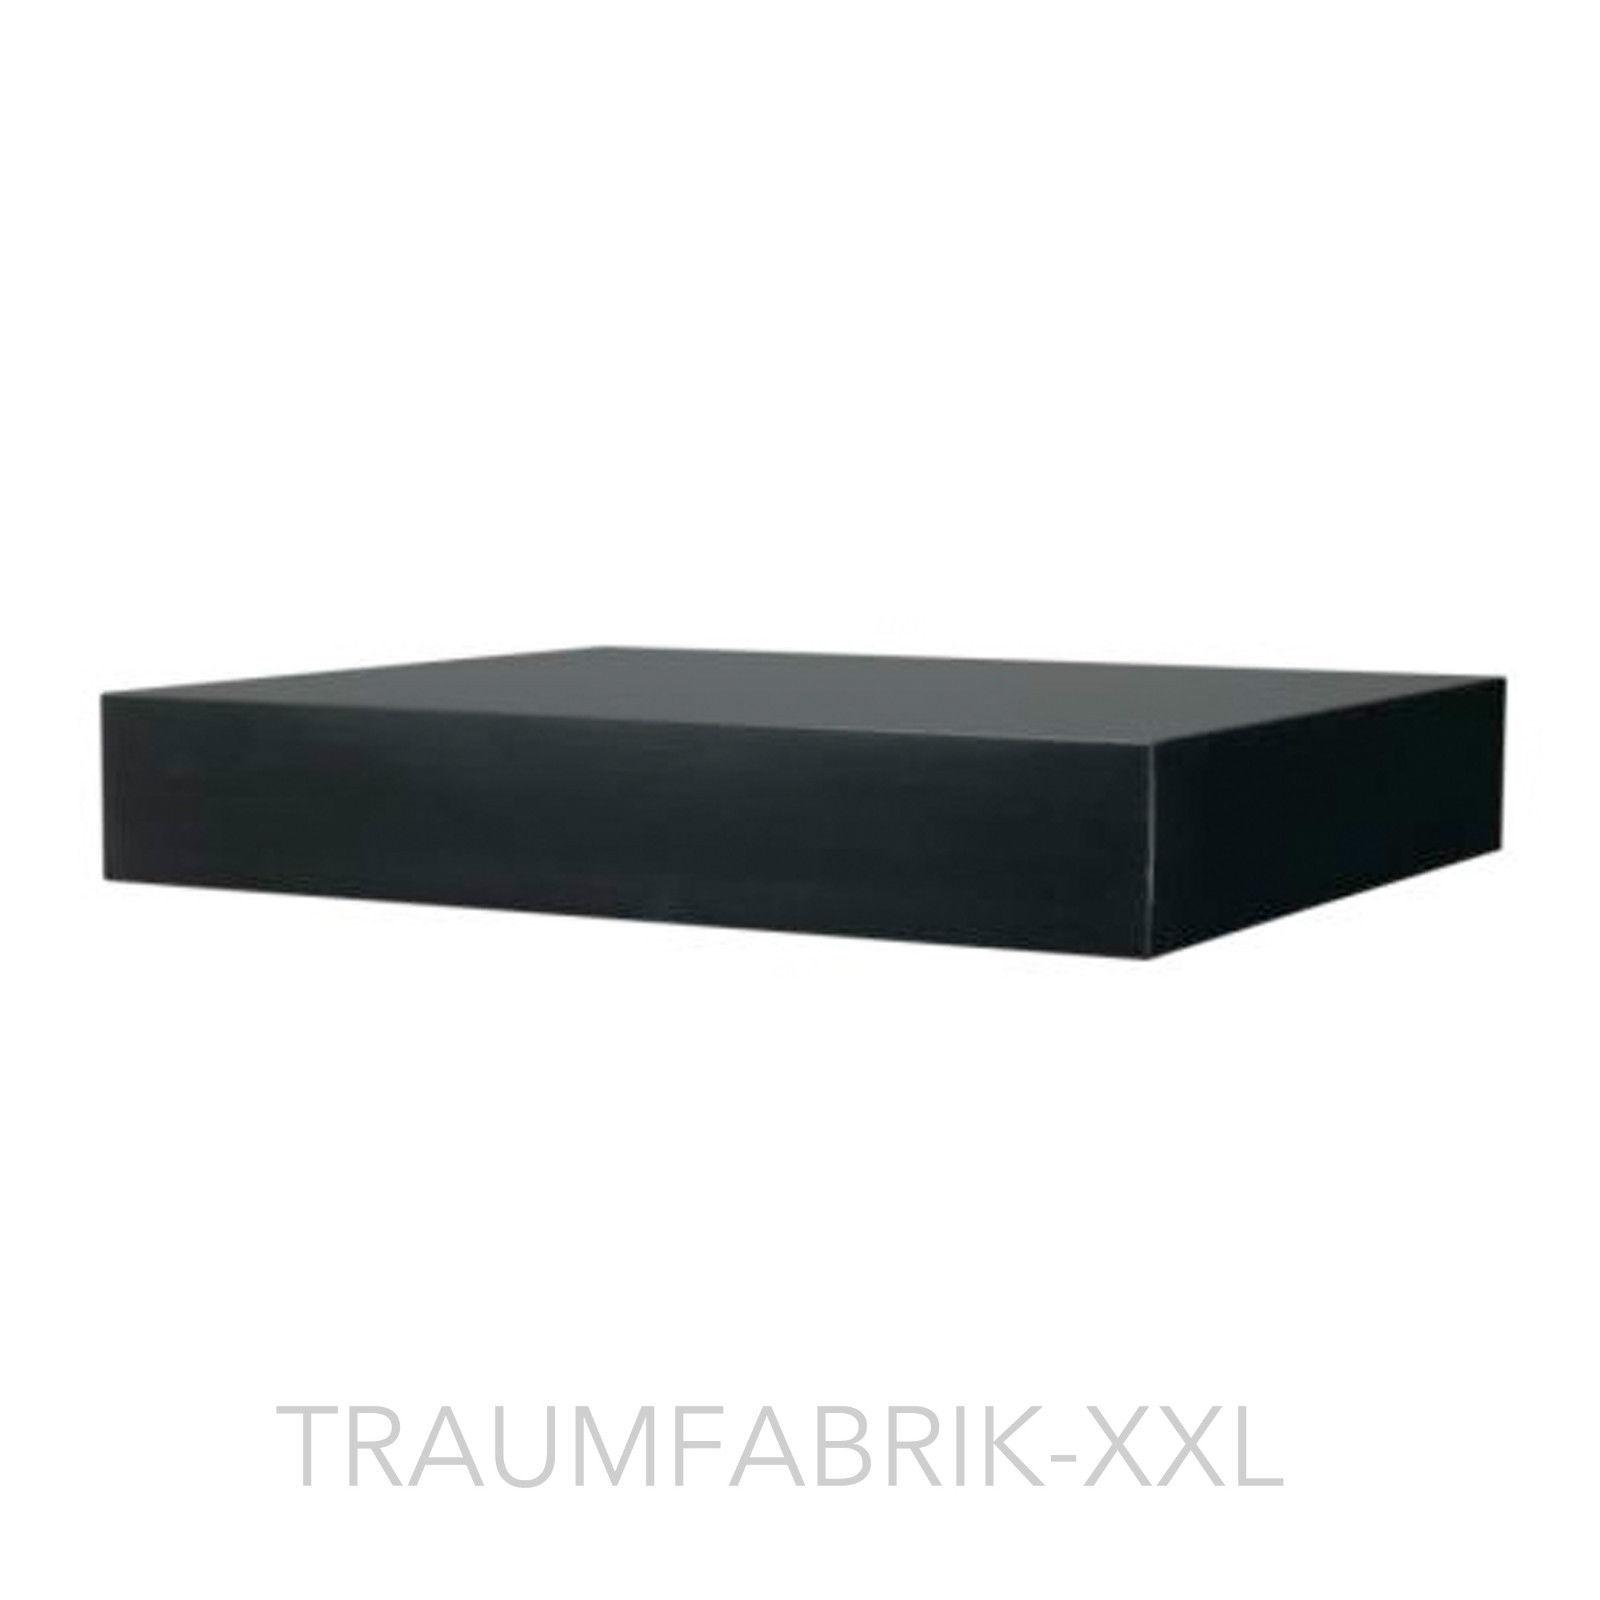 ikea designer wandregal 30 26 cm regal schwarz lounge ablage b cherregal neu ovp traumfabrik xxl. Black Bedroom Furniture Sets. Home Design Ideas